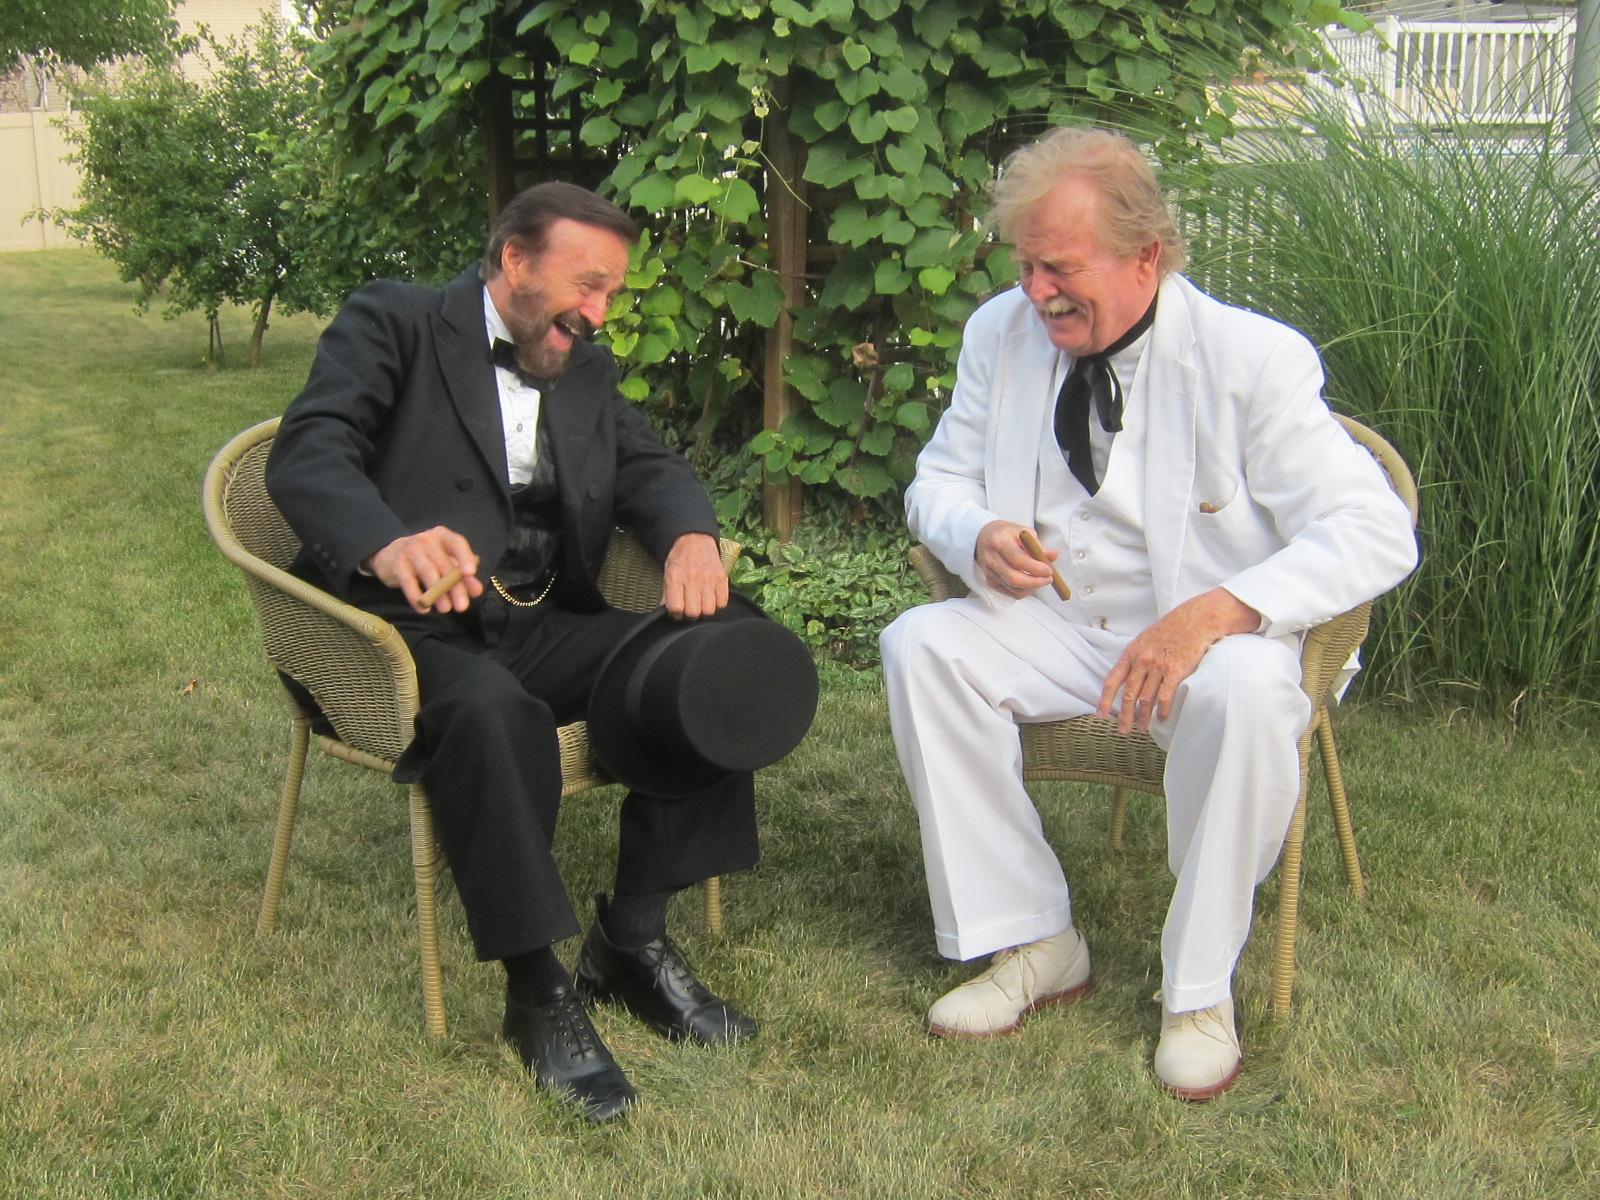 Grant and Twain laughing IMG_5581.JPG